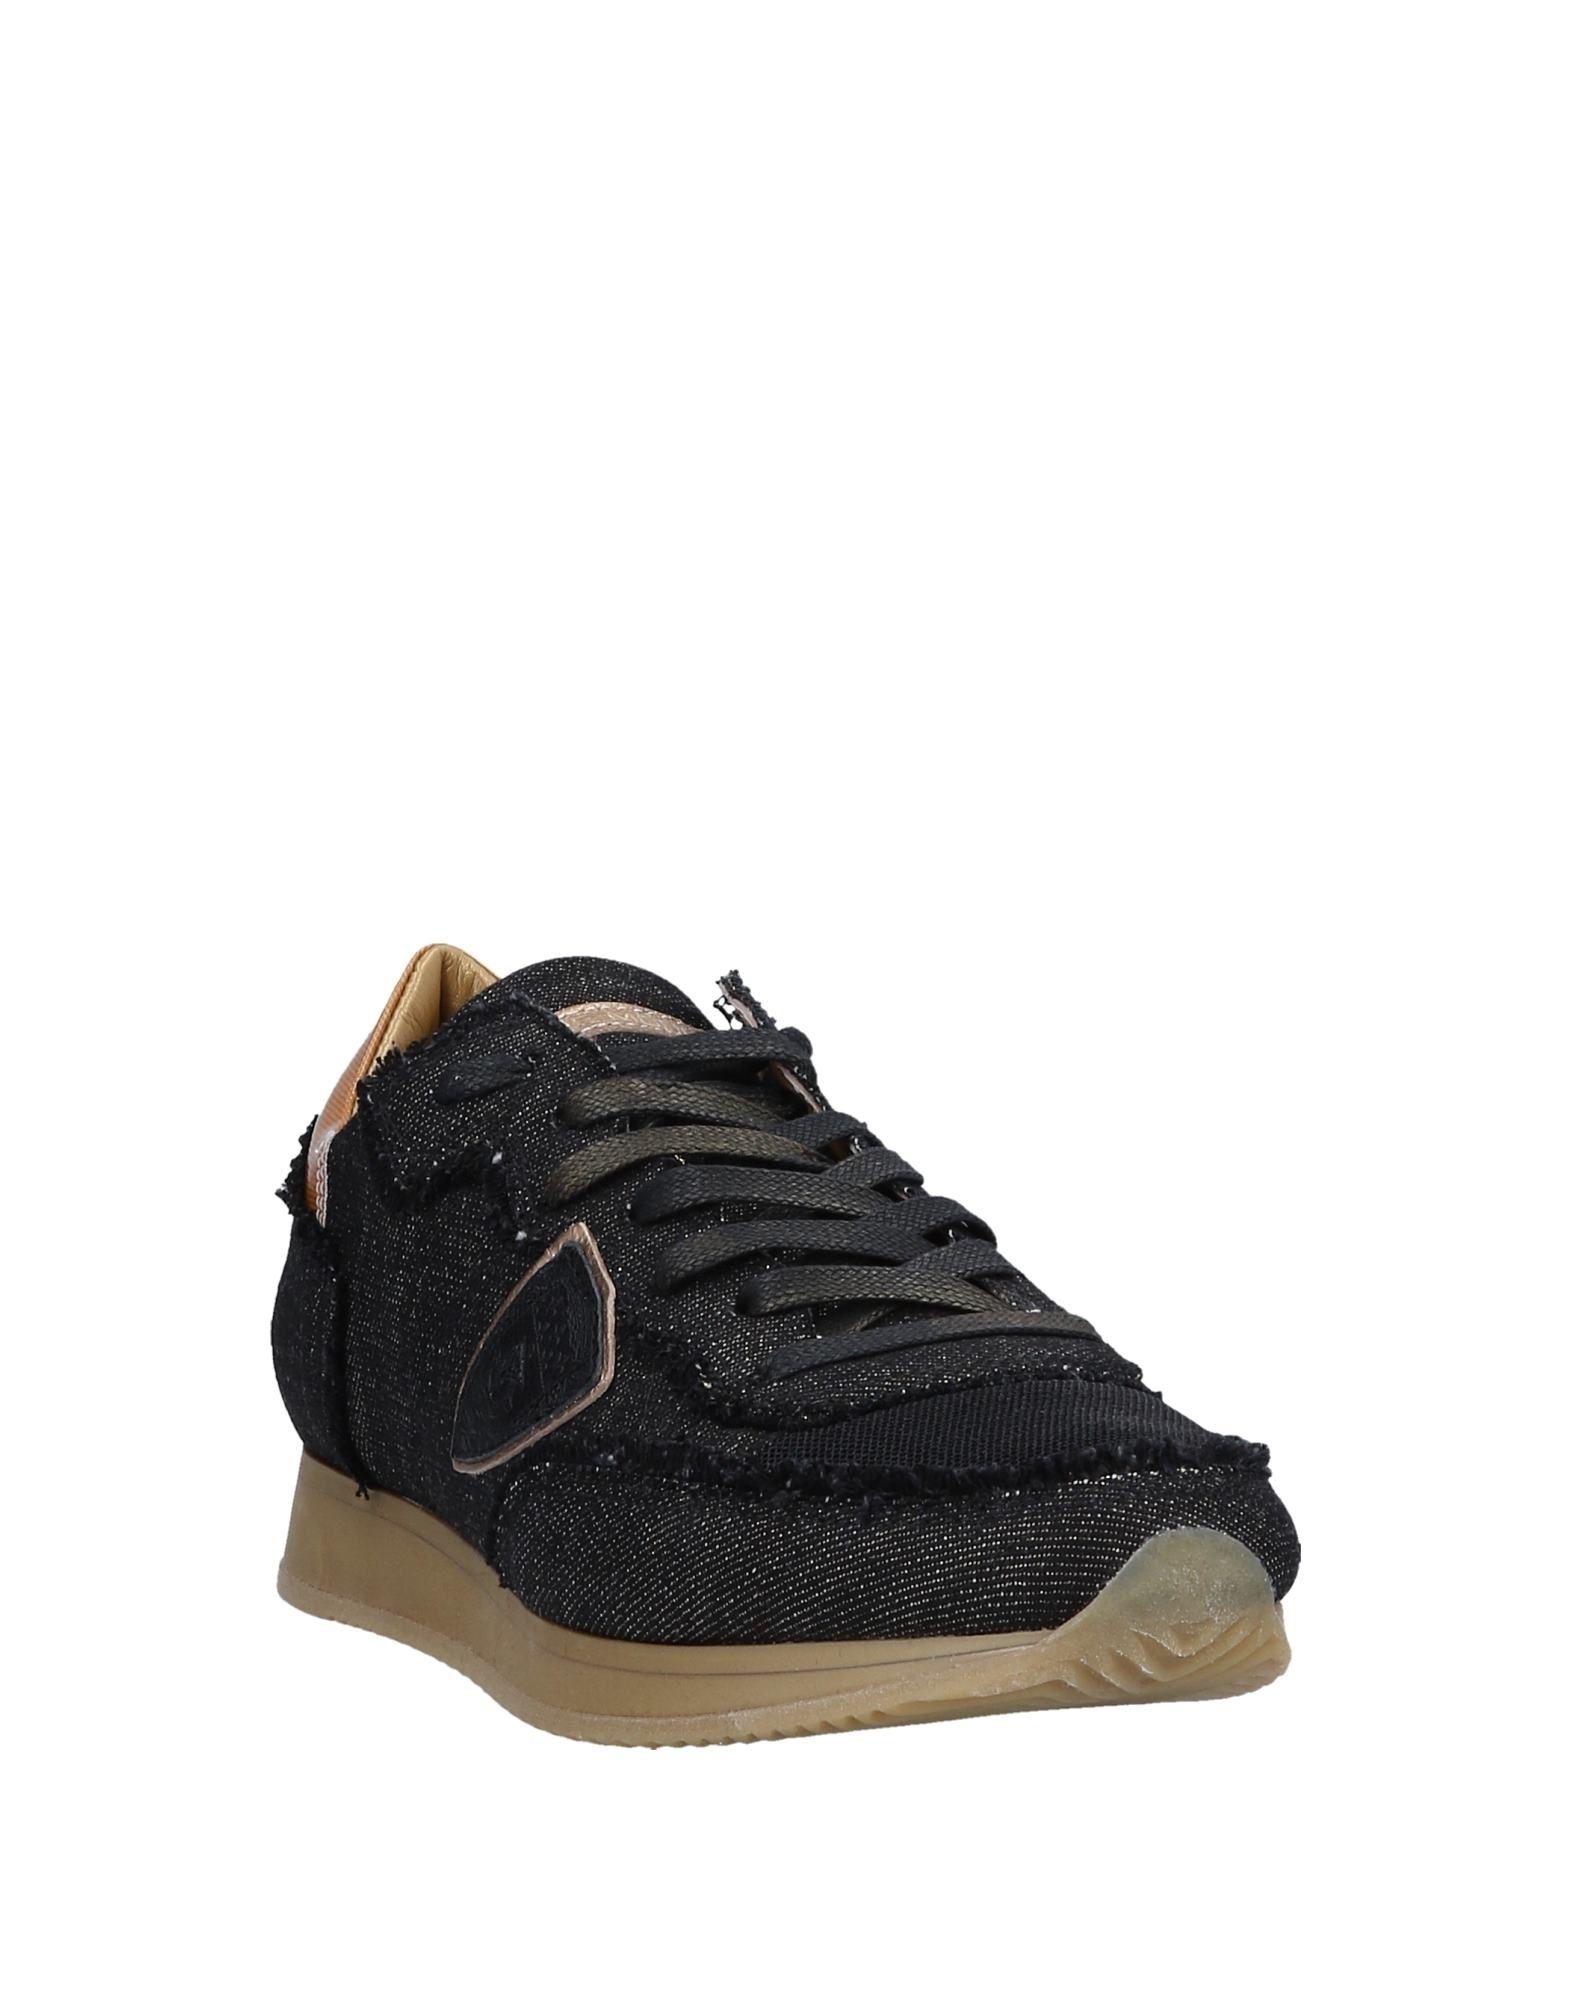 Philippe Model Turnschuhes Damen 11565538MGGut 11565538MGGut 11565538MGGut aussehende strapazierfähige Schuhe 4efb0c